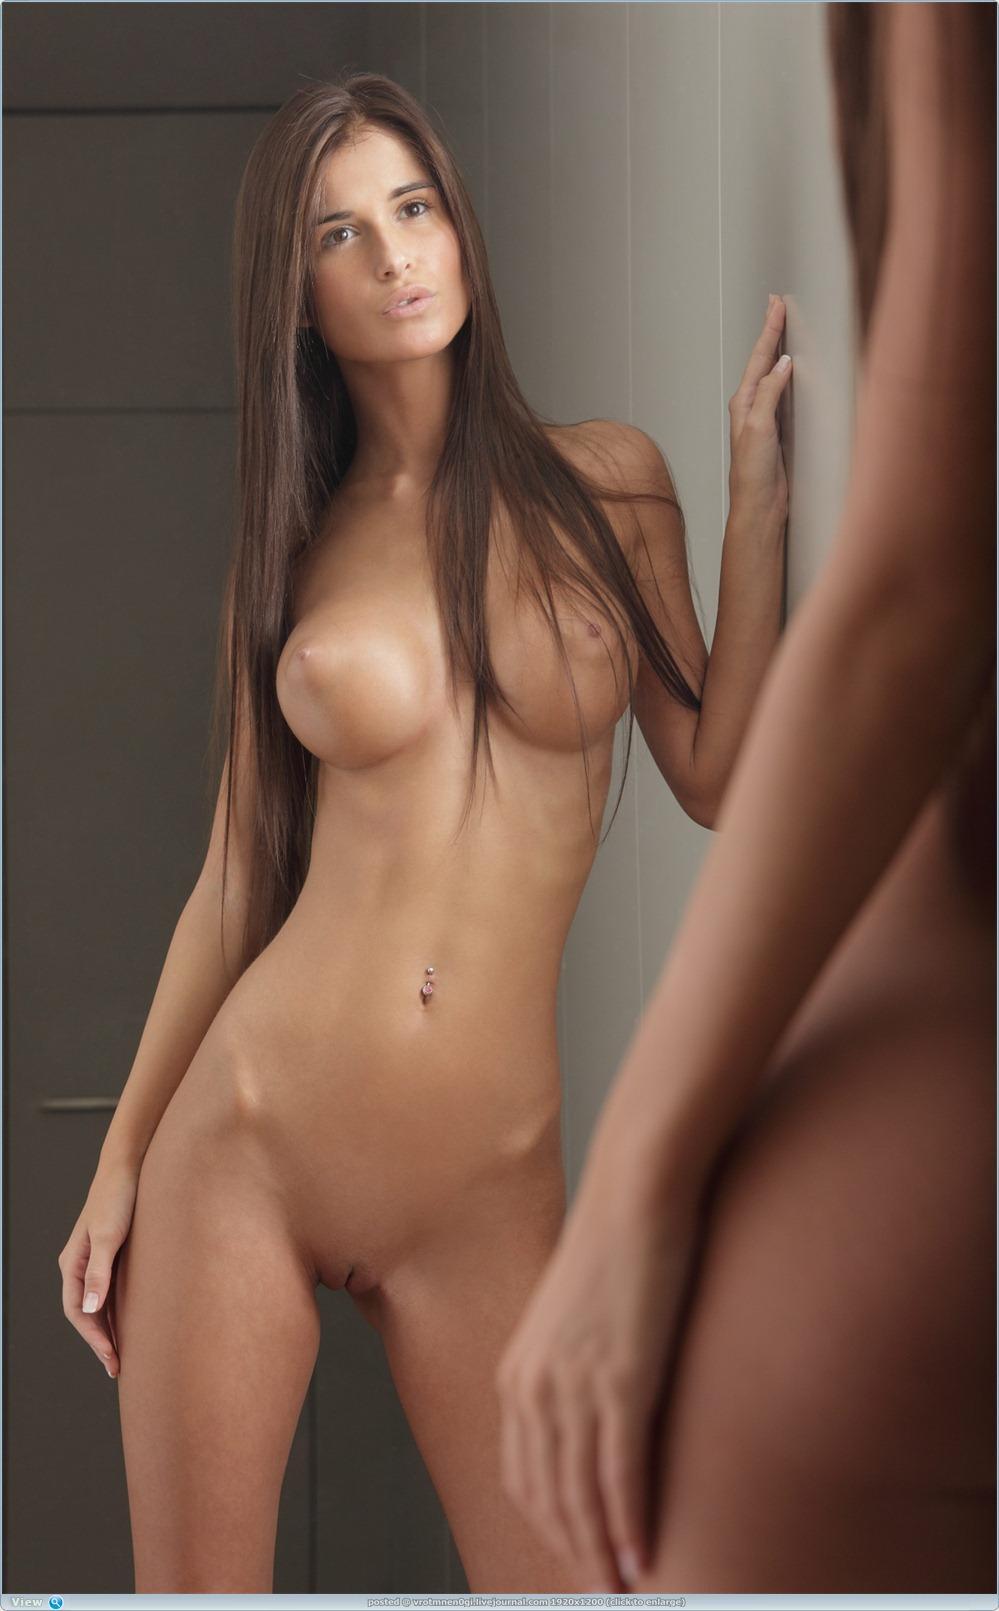 Flexible nude women porn